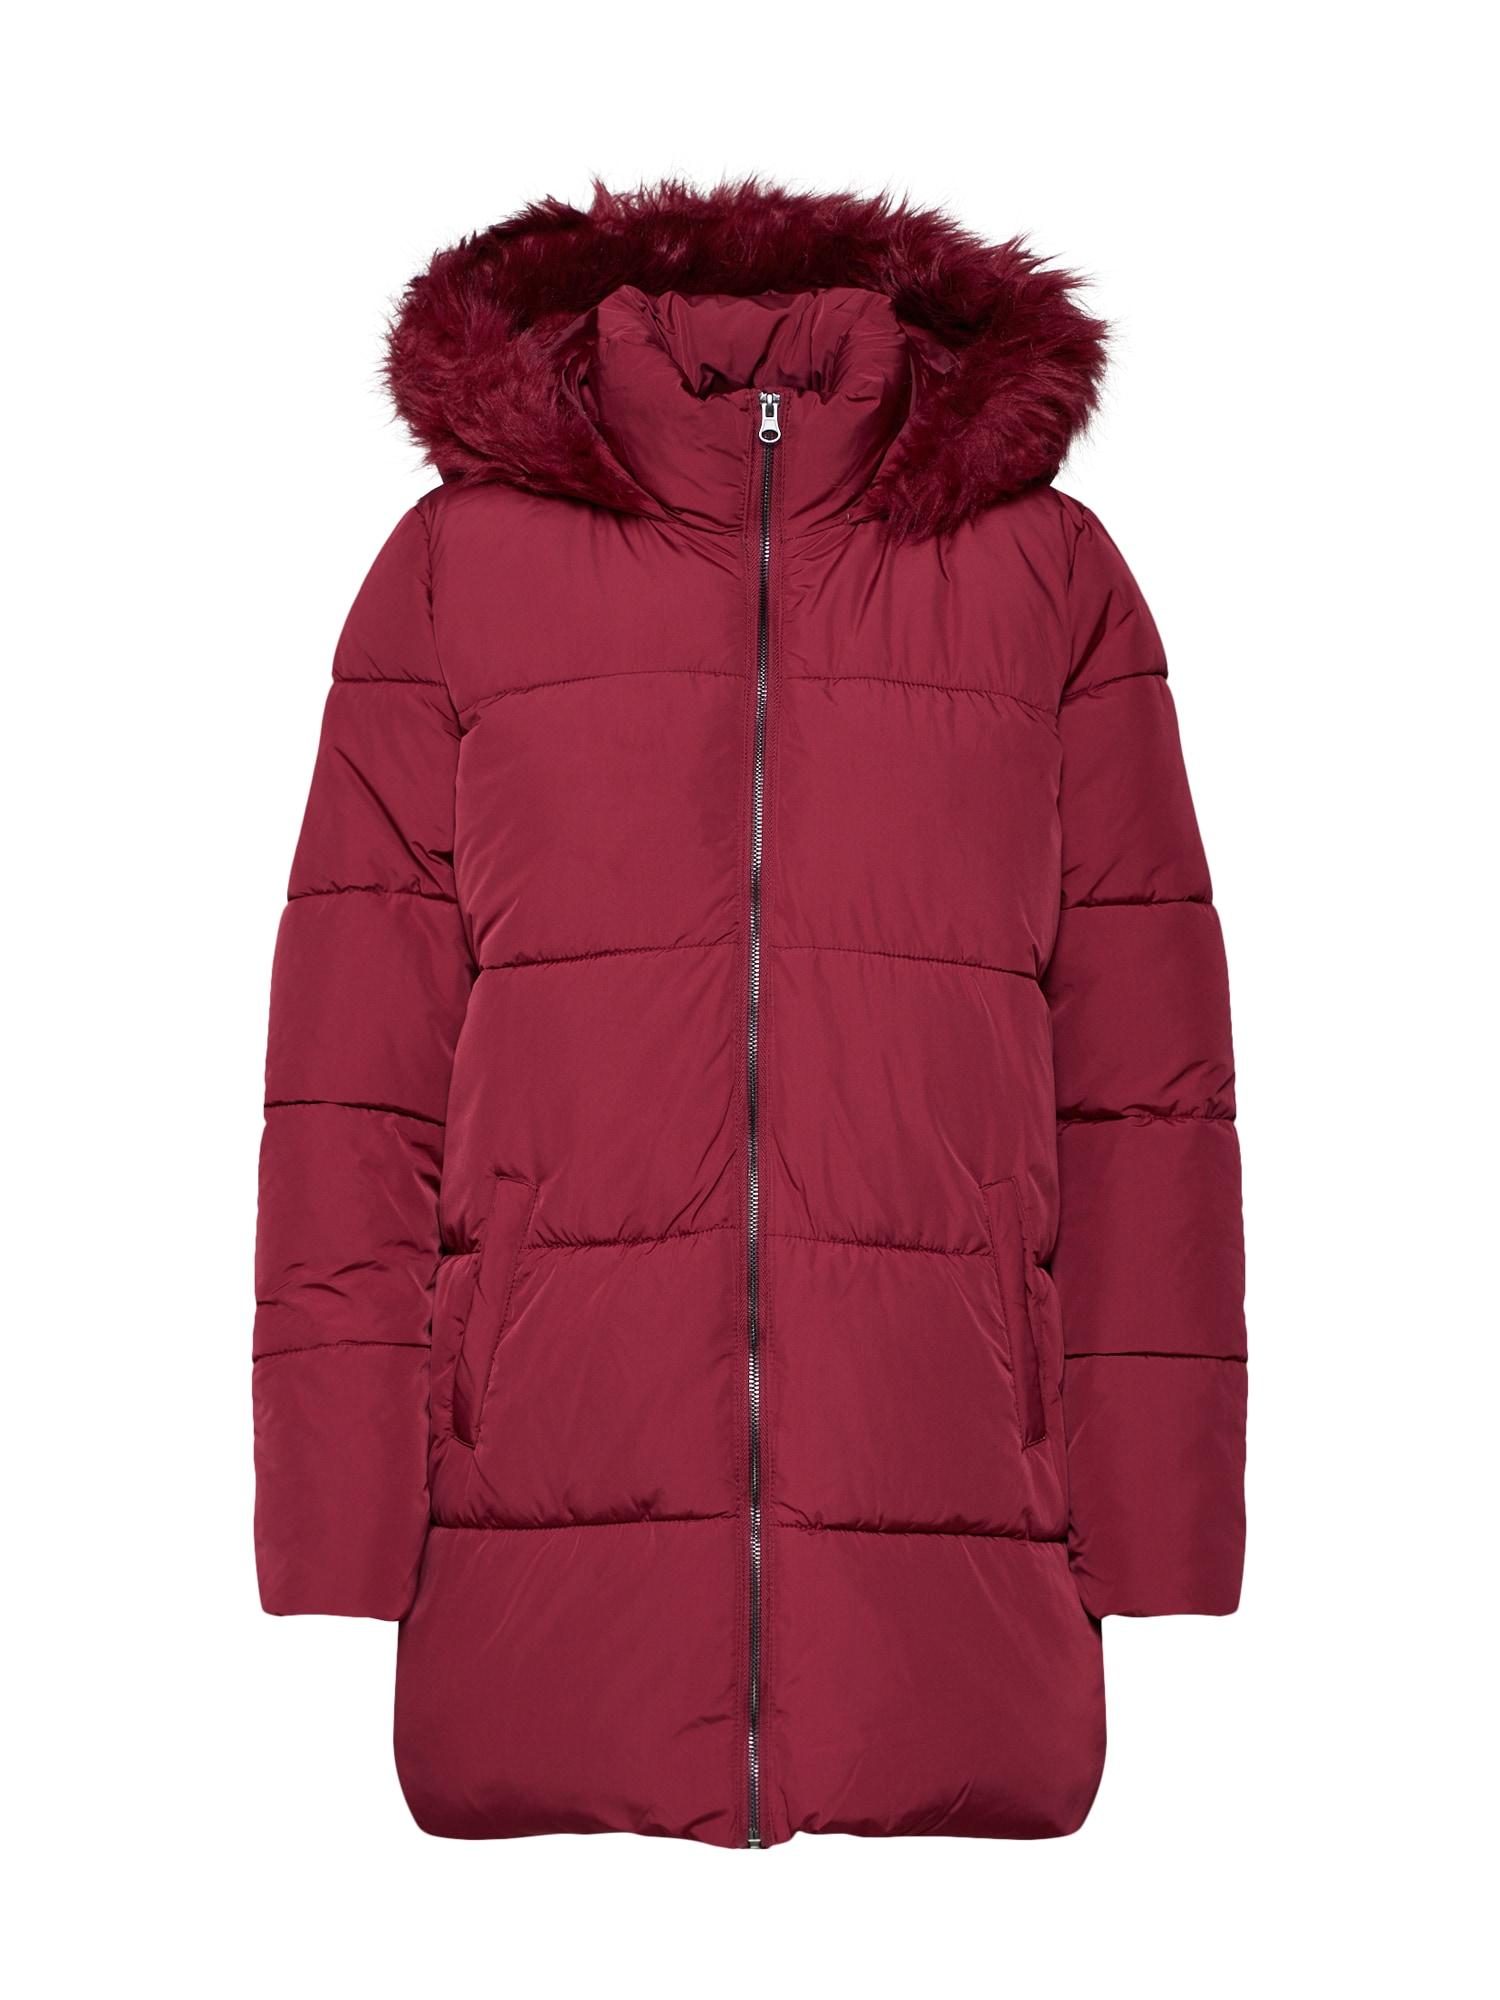 Zimní kabát ELMA malinová JACQUELINE De YONG